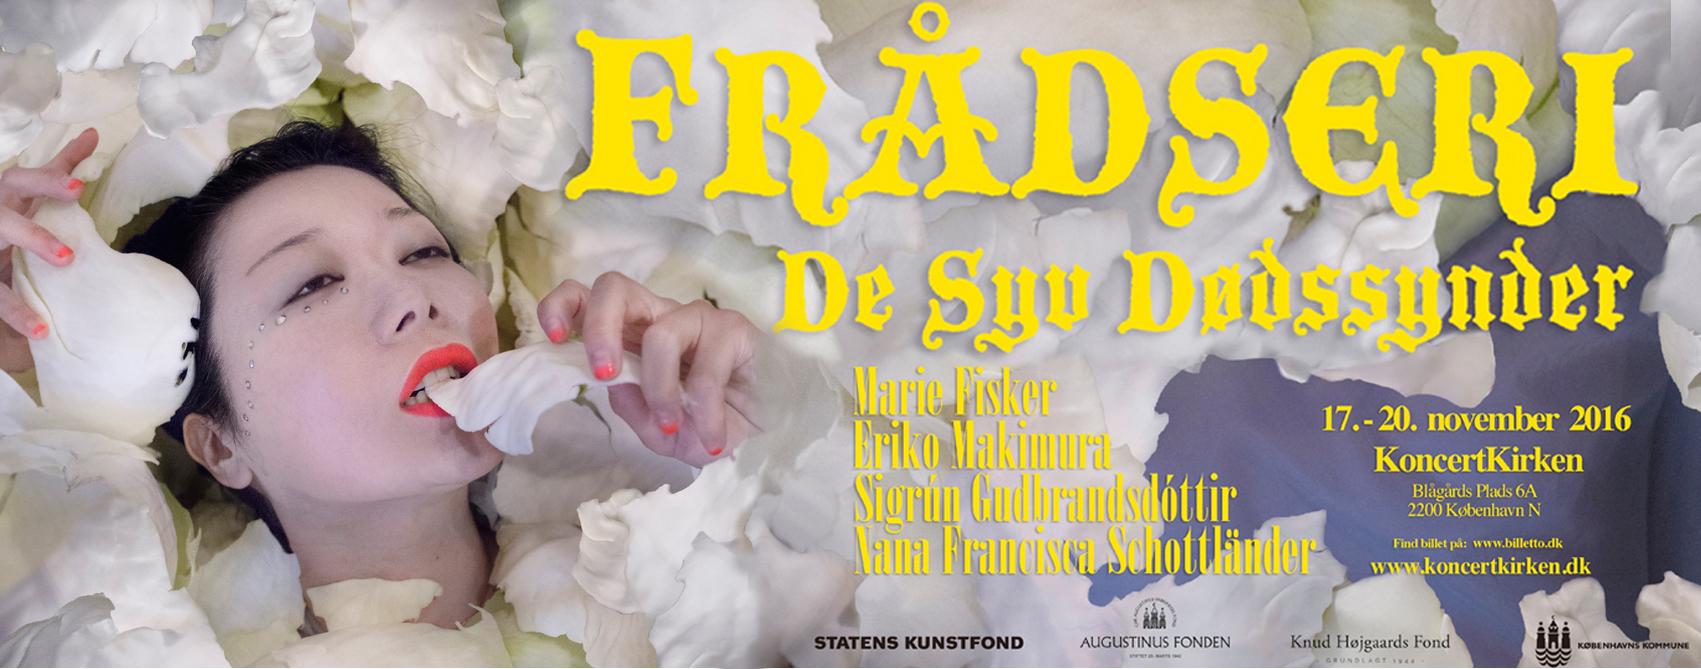 fraadseri-plakat-bredlr